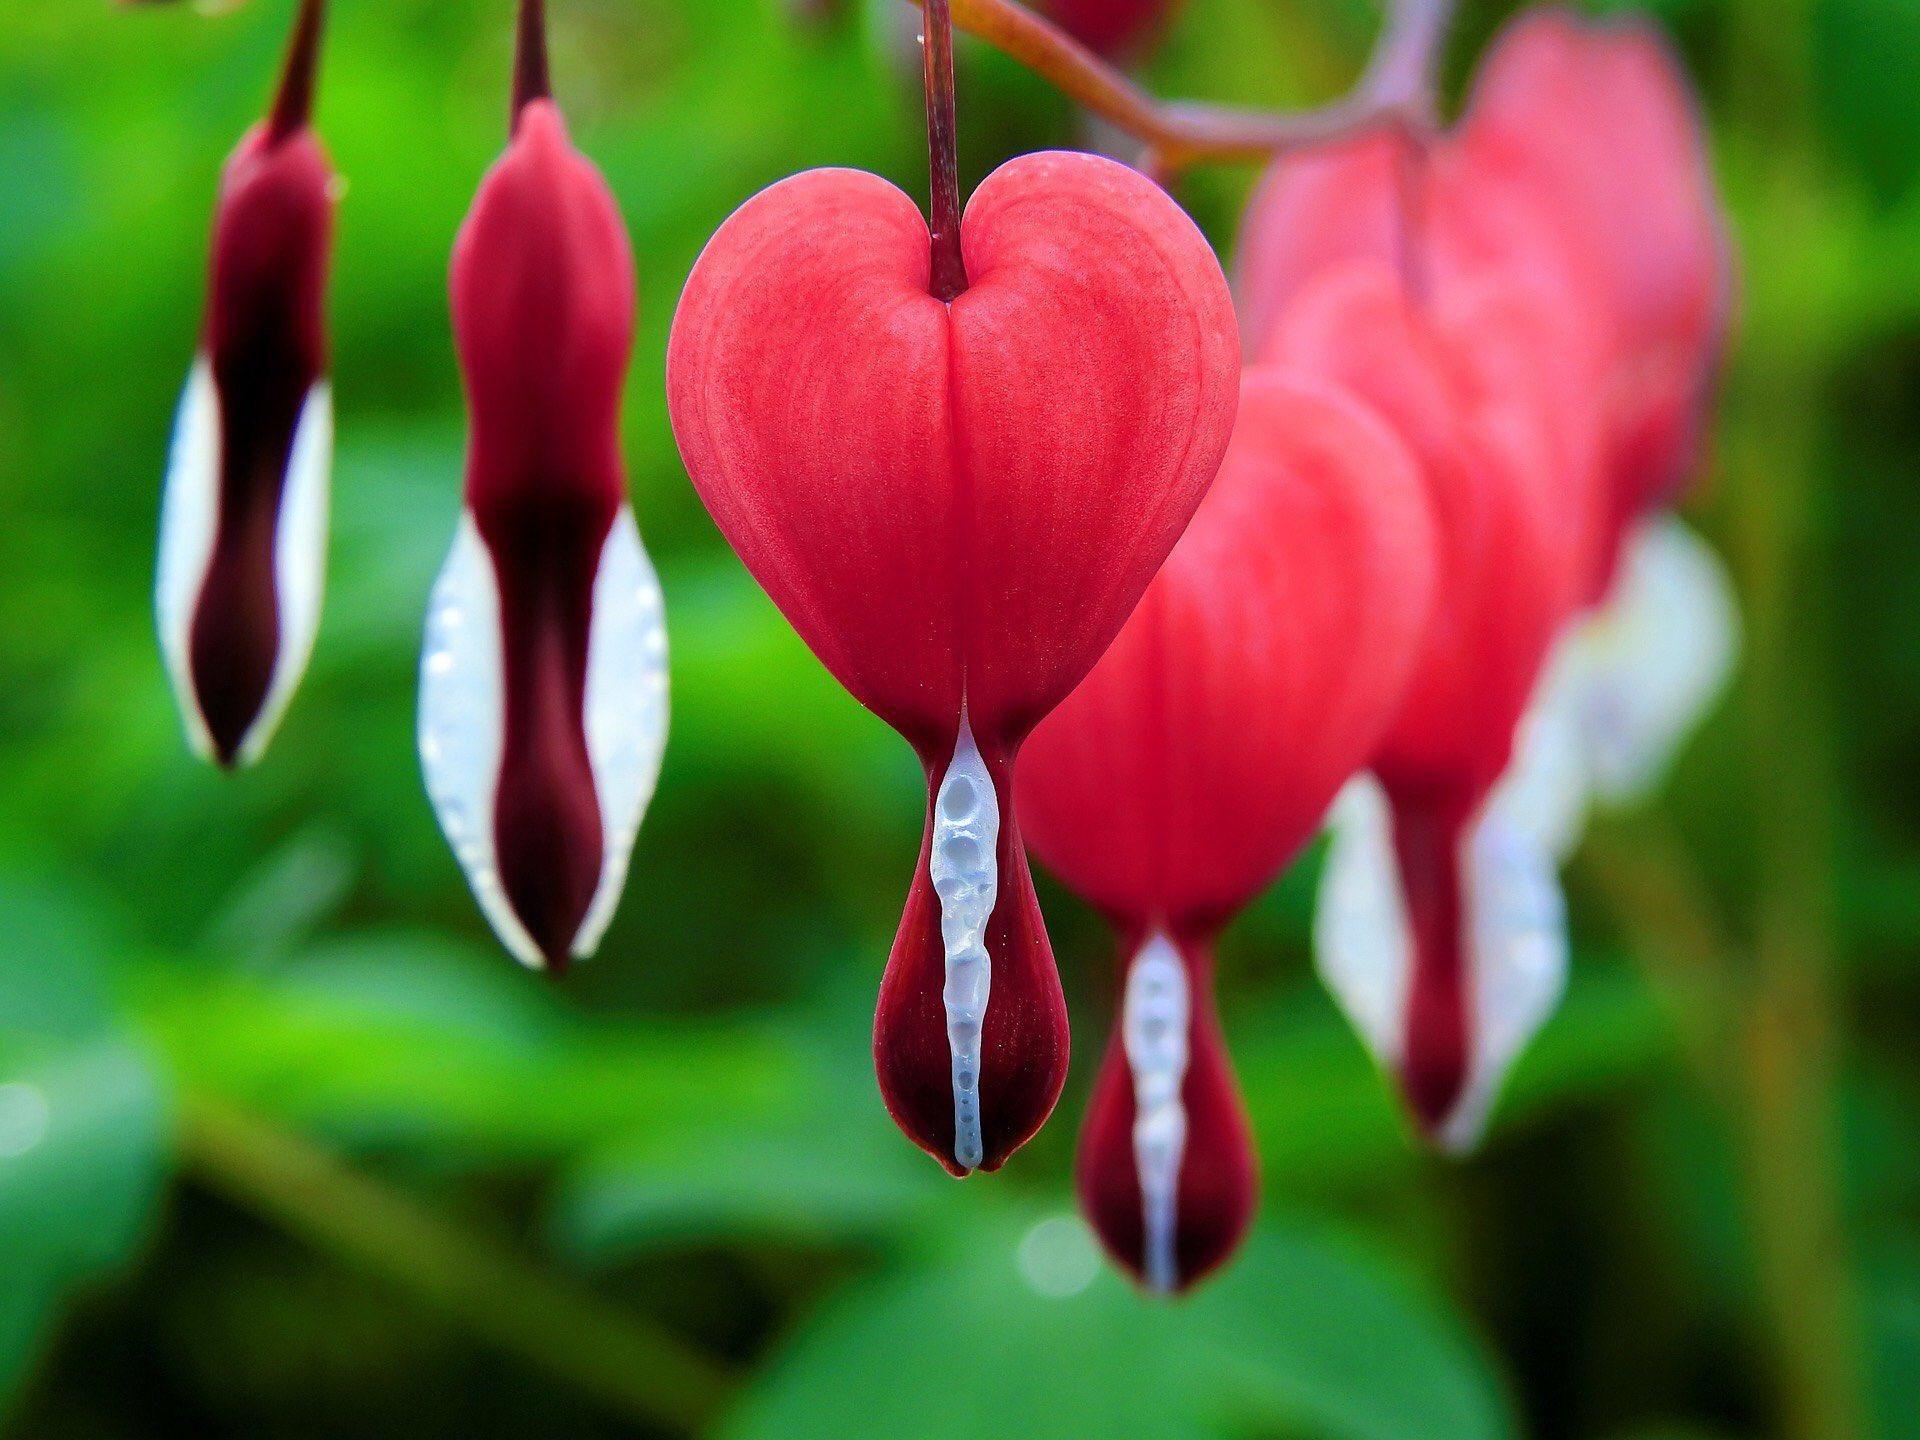 The Bleeding Heart Flower Lamprocapnos Spectabilis Although Aesthetically Pleasing This Flower Is In 2020 Bleeding Heart Flower Bleeding Heart Plant Bleeding Heart